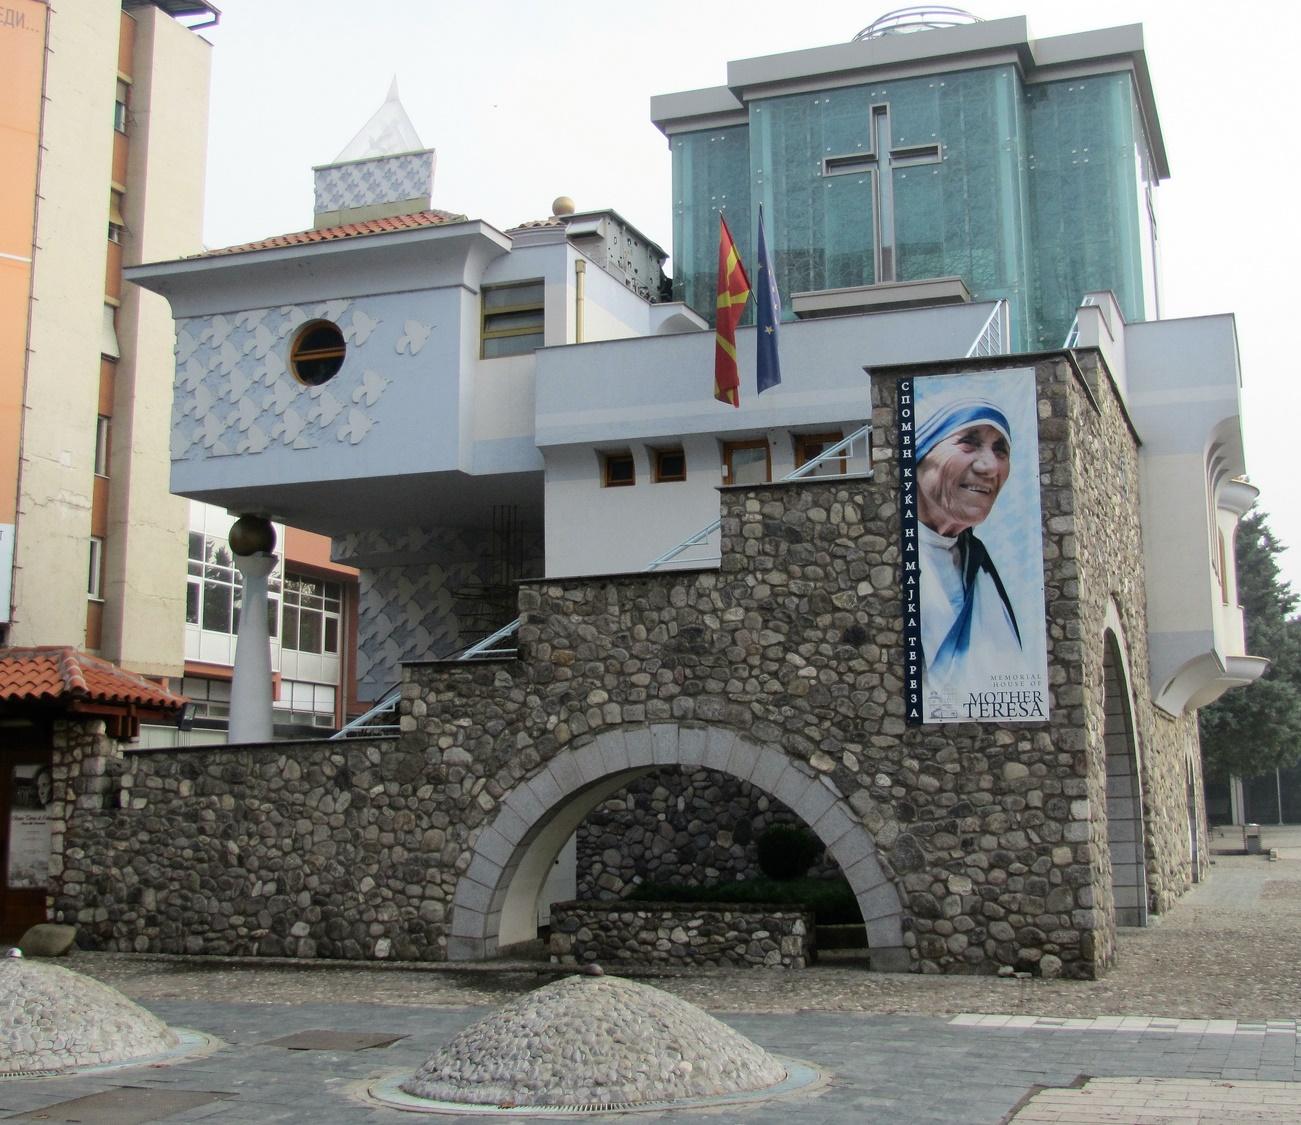 Sapevate che Madre Teresa nacque a Skopje? - North Macedonia Timeless